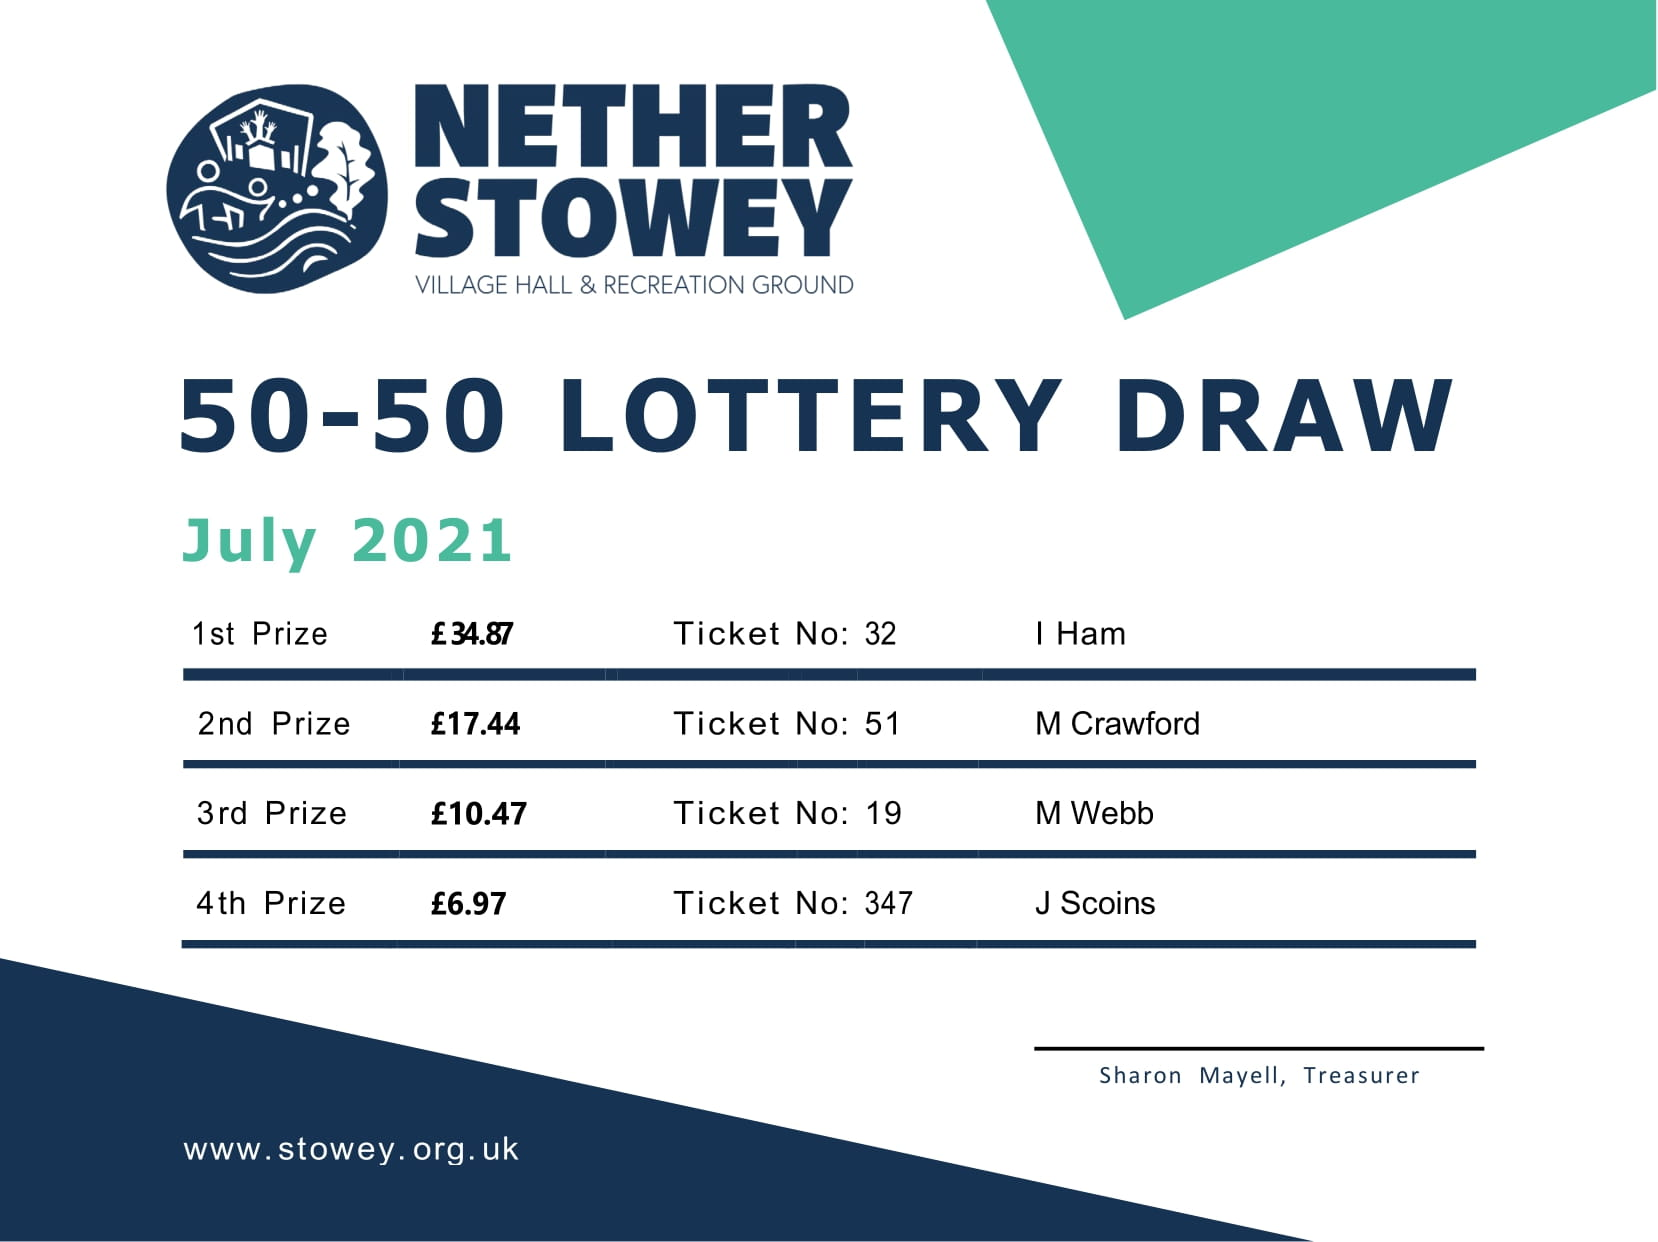 Nether Stowey 50-50 Lottery July 2021